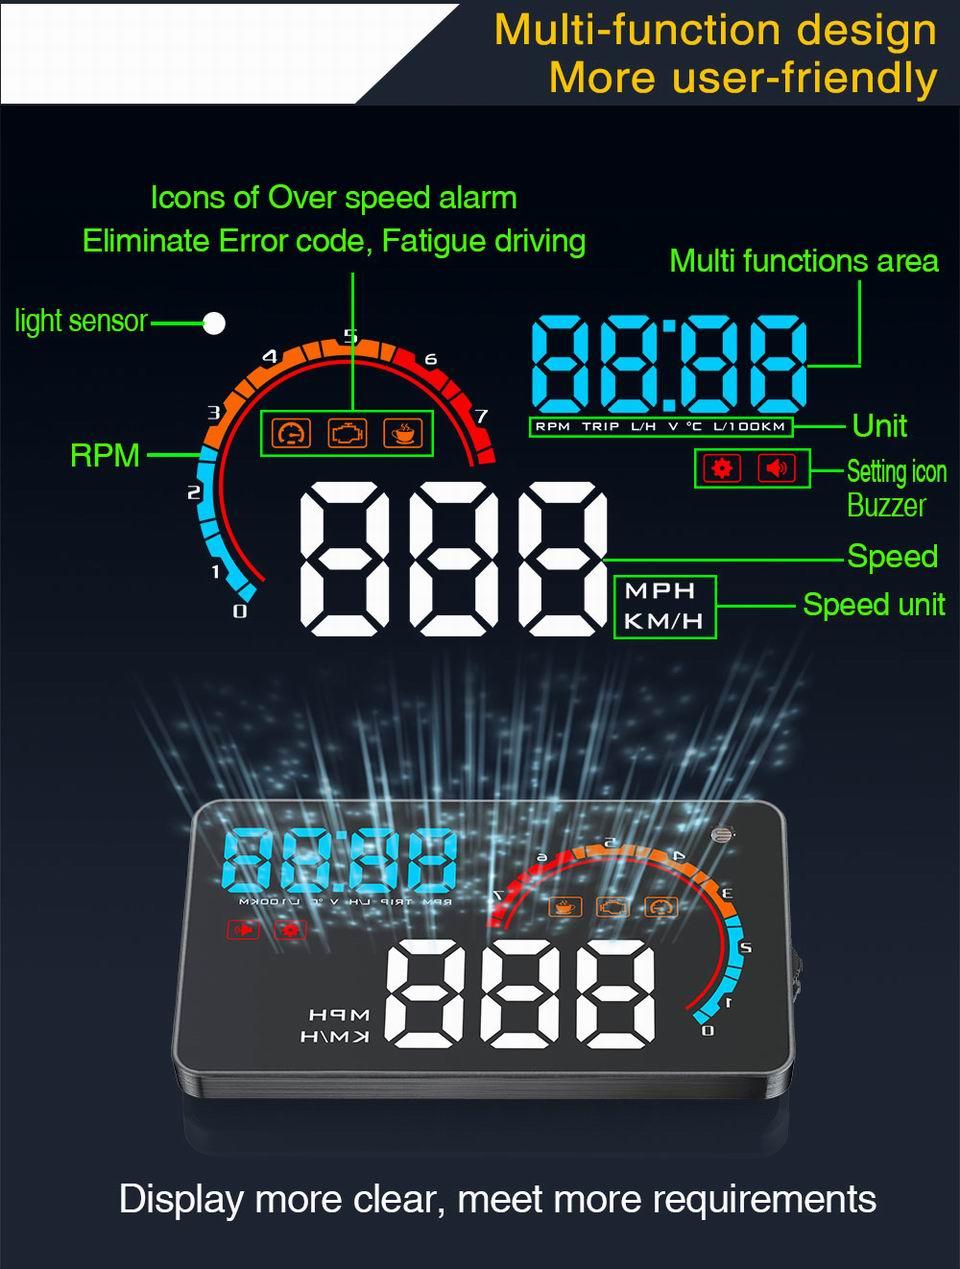 HTB1tW.obYZnBKNjSZFGq6zt3FXa5 - Car Head Up Display Projector Shows Speed Warning Fuel Consumption